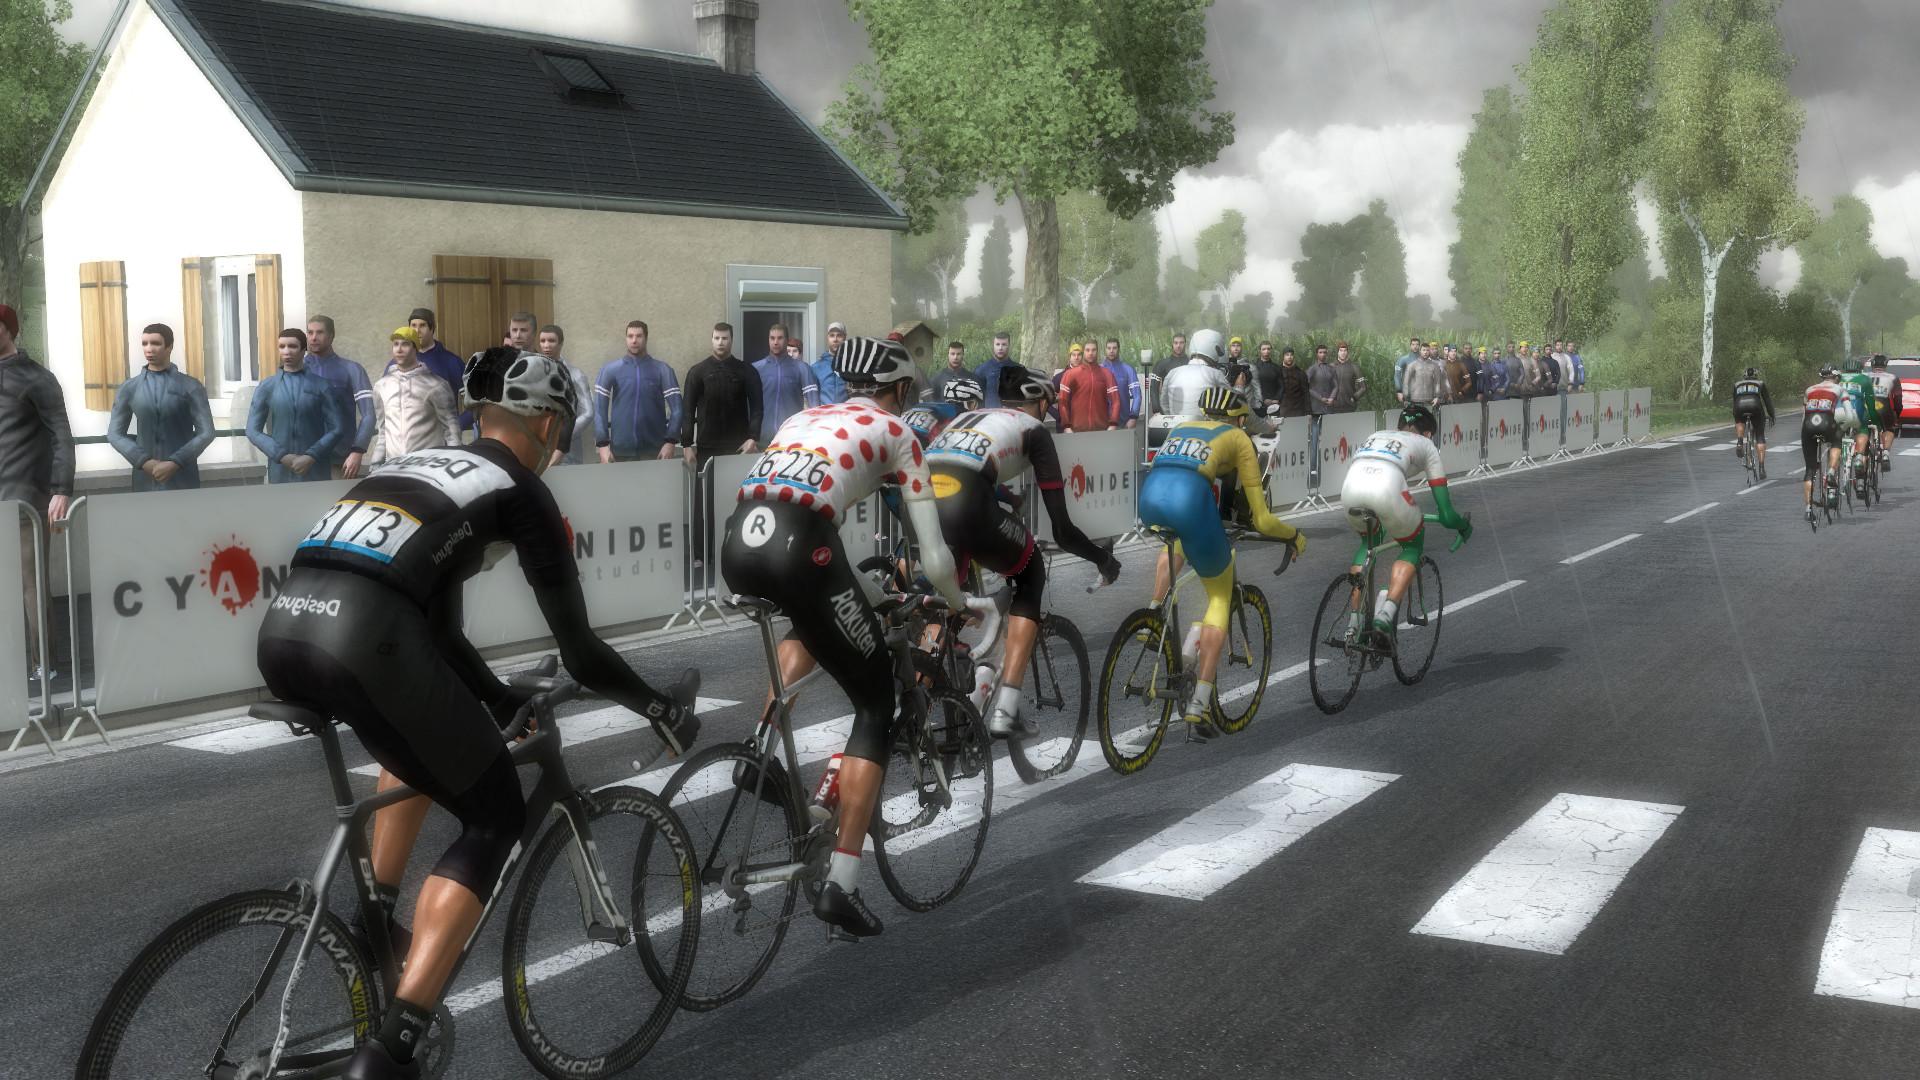 pcmdaily.com/images/mg/2019/Races/PTHC/Pologne/E5/03.jpg